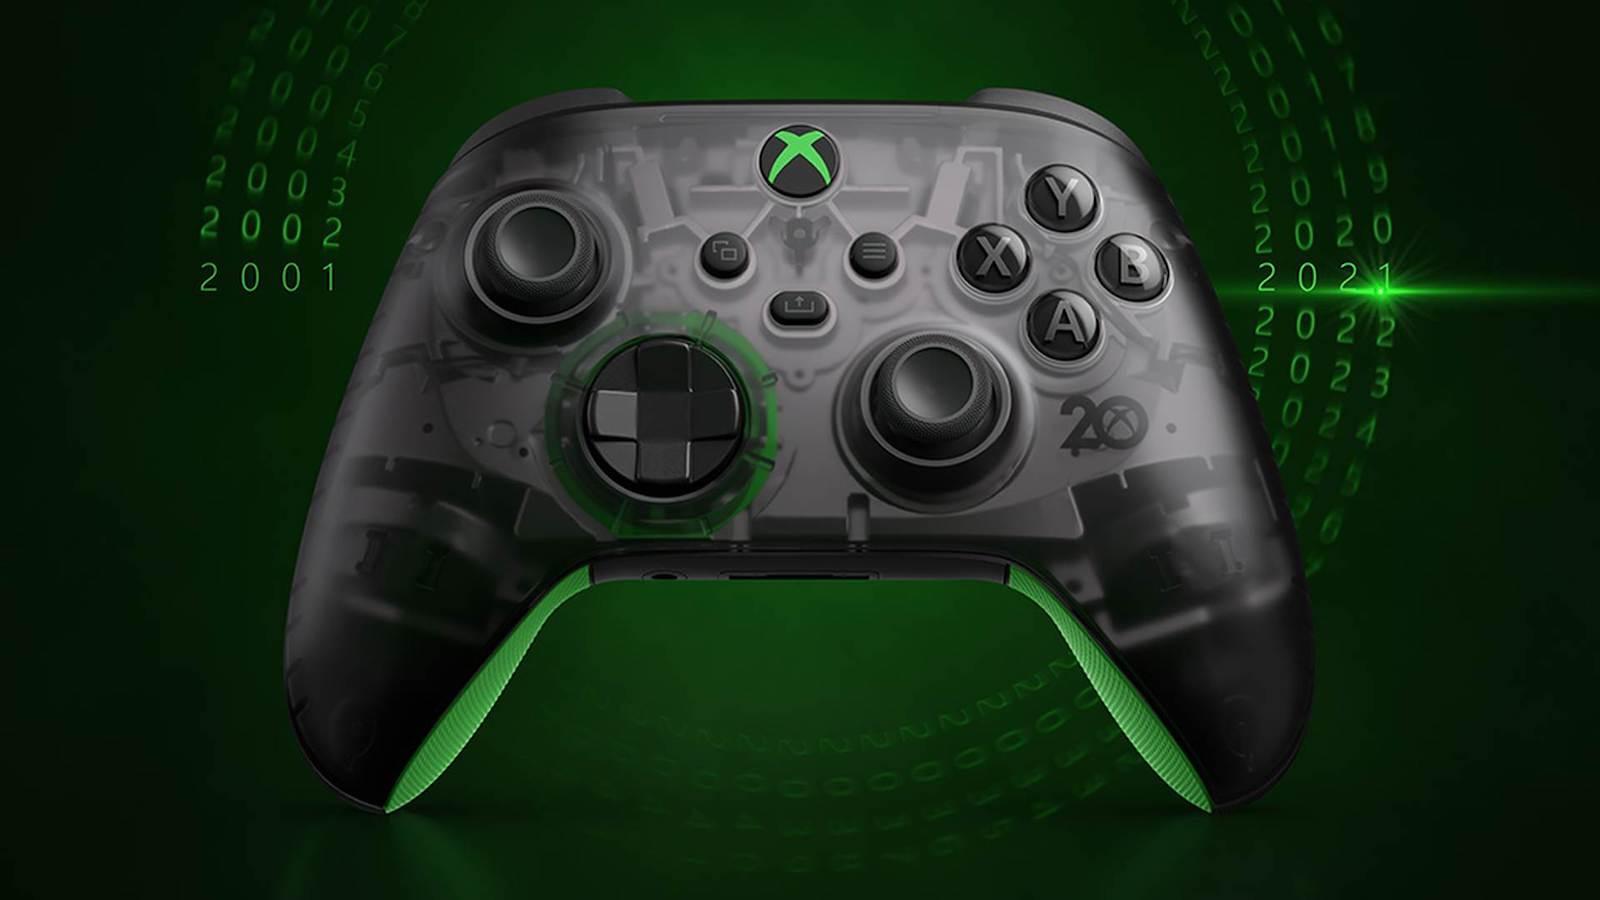 Microsoft-Xbox-Wireless-Controller-20th-Anniversary-Special-Edition-01.jpeg